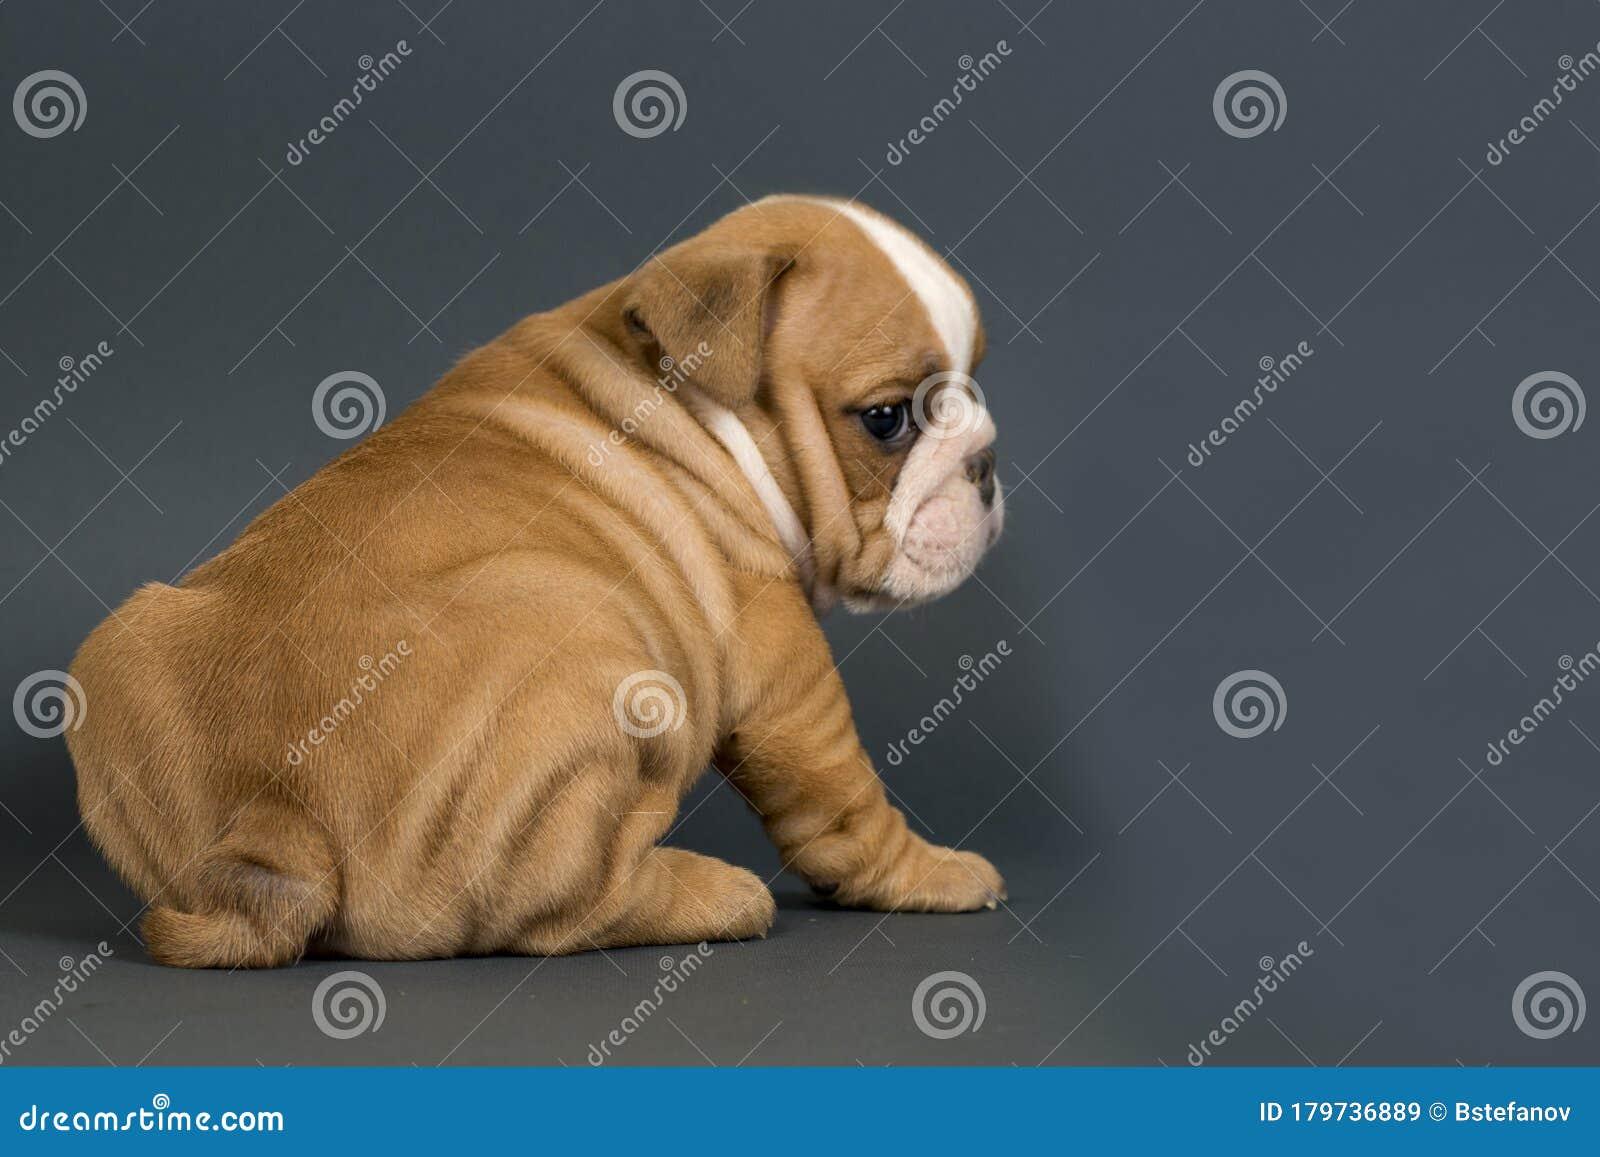 English Bulldog Puppy Stock Image Image Of Text British 179736889